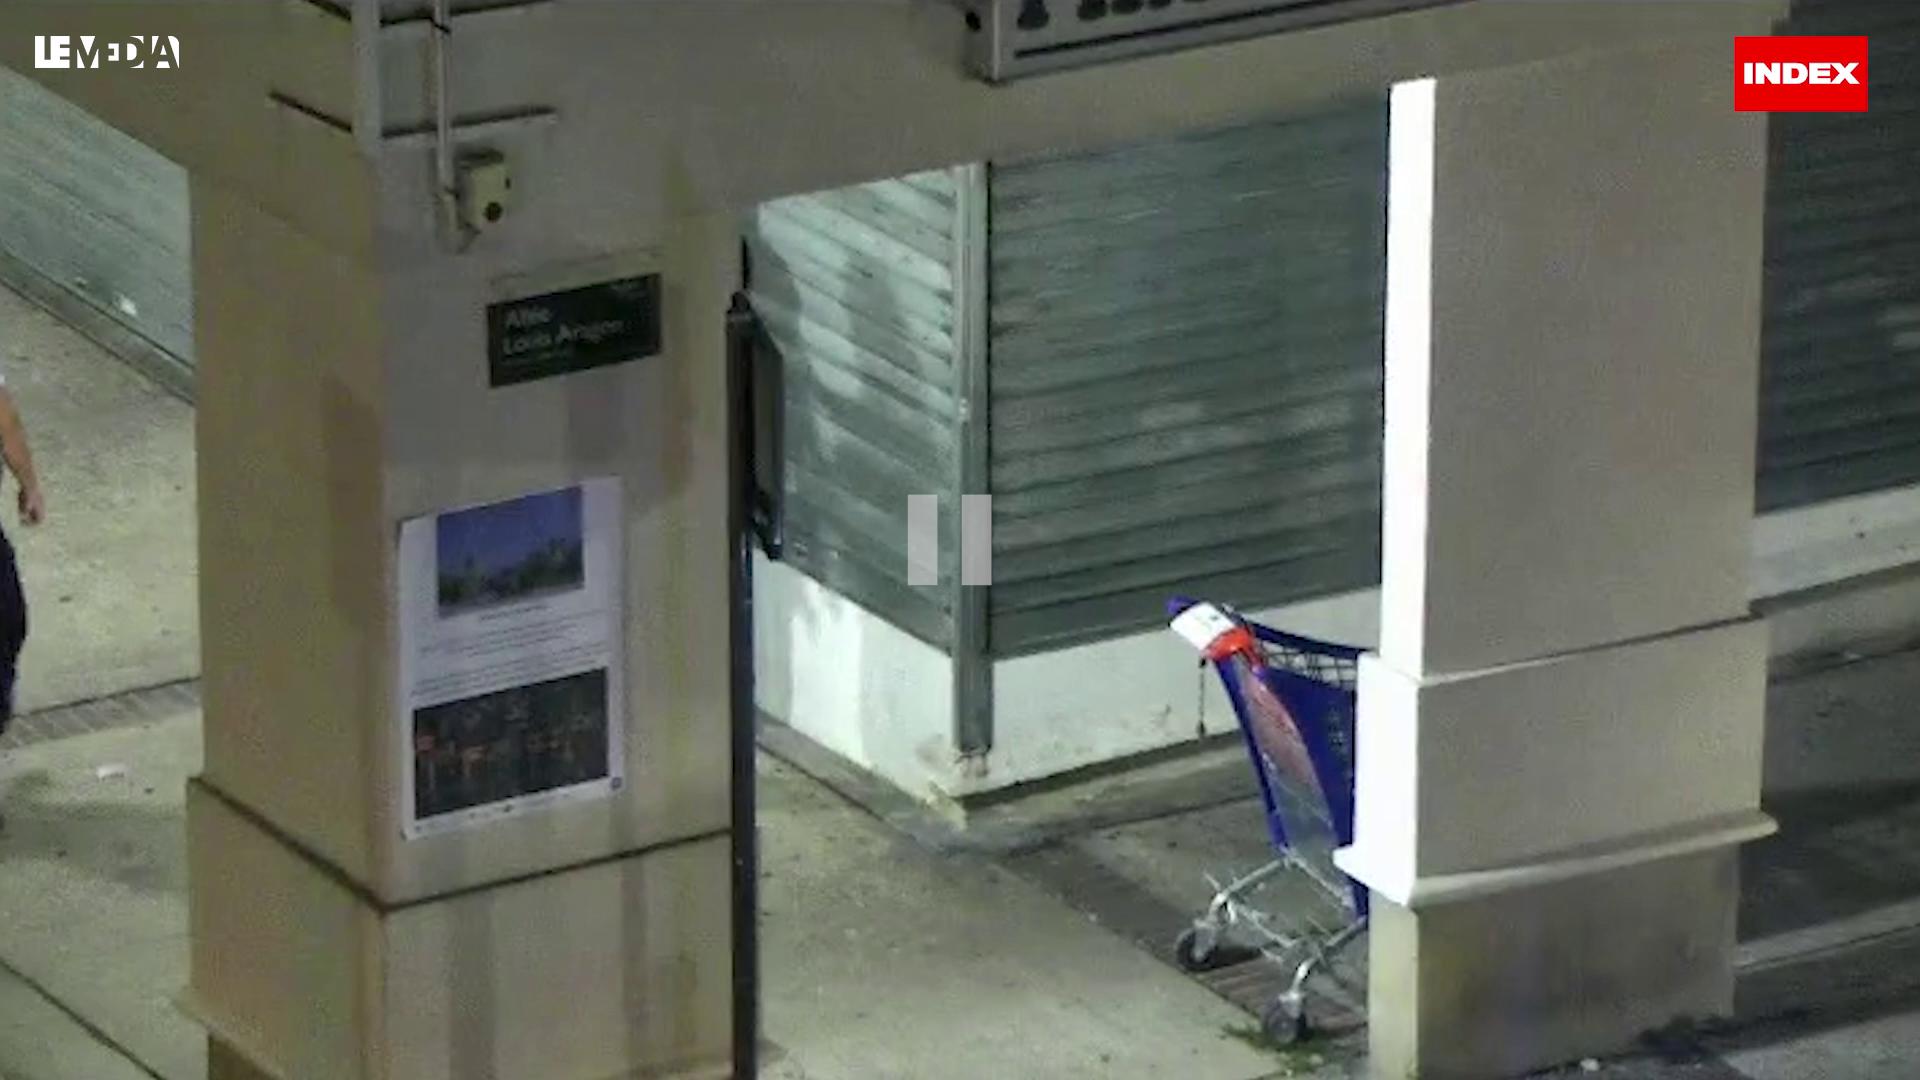 Exclusif - Noisy-le-Grand: la vidéo qui accable la police